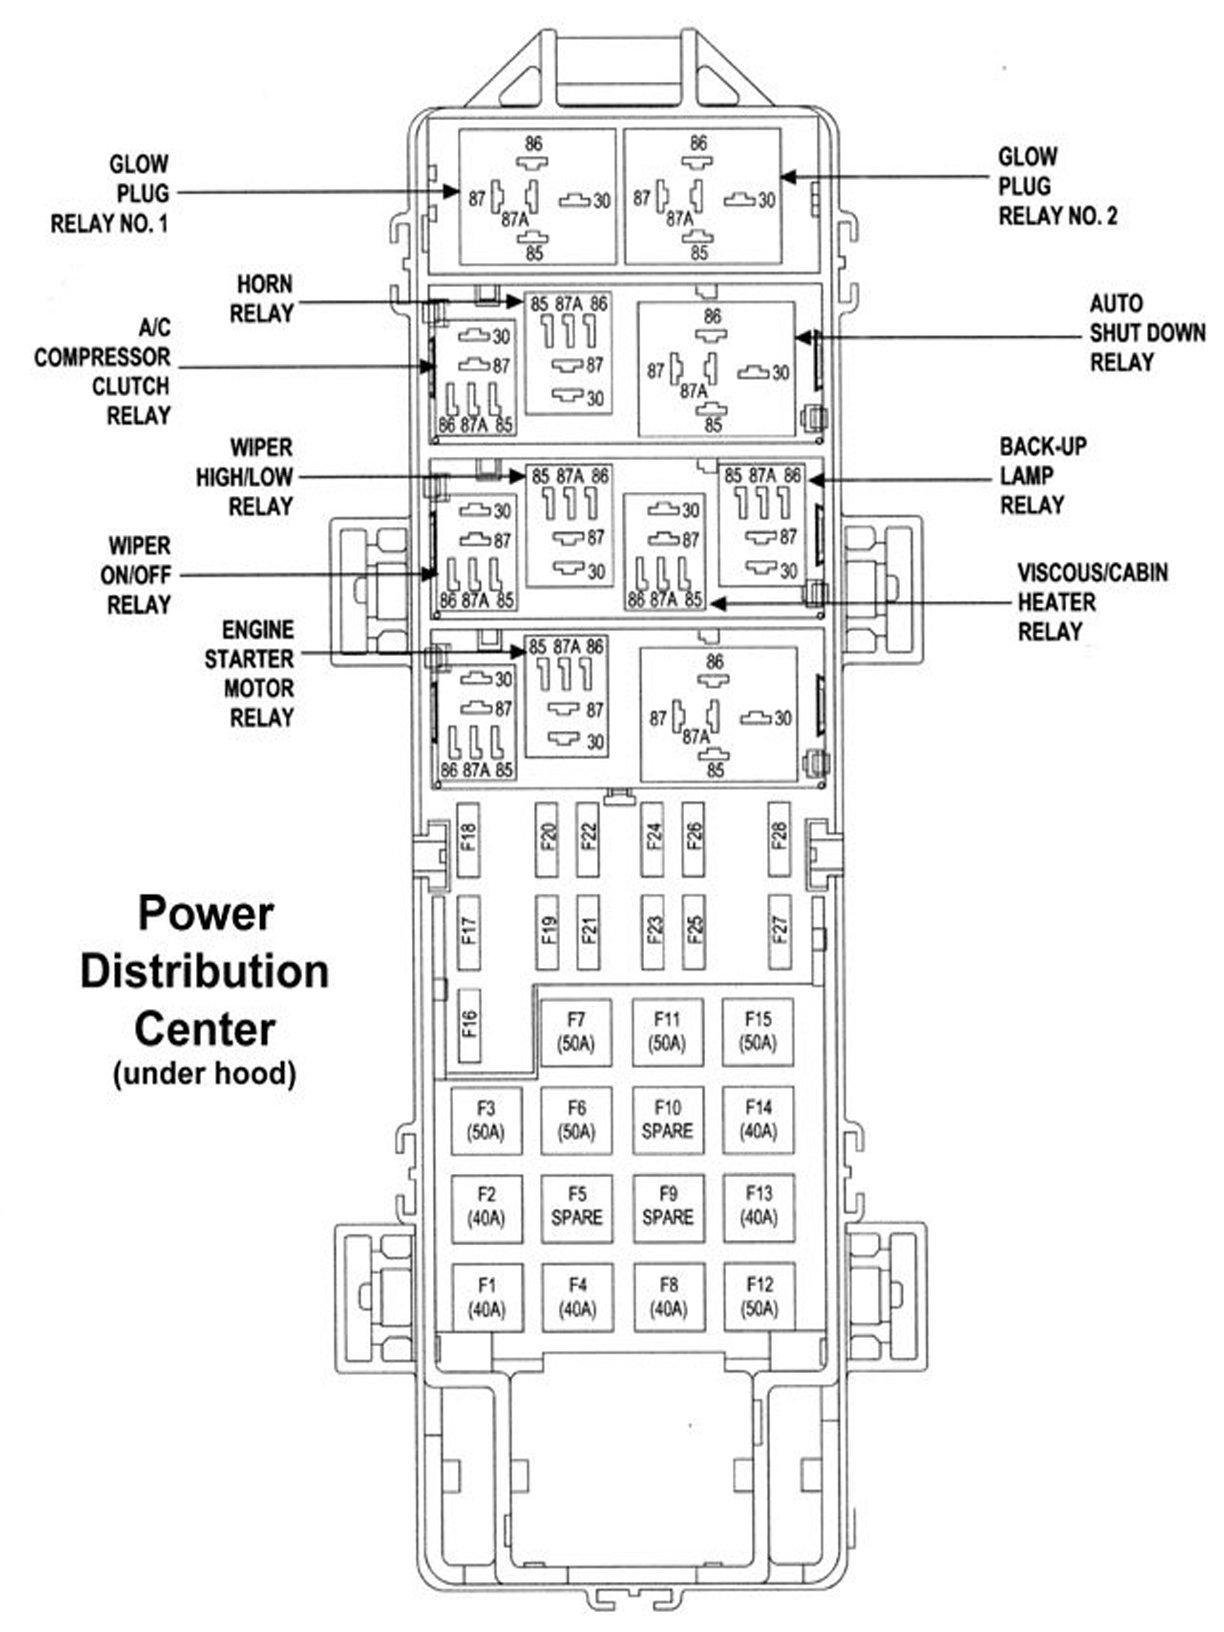 1999 jeep fuse box wiring diagram expert 1999 jeep wrangler fuse box 1999  jeep fuse box